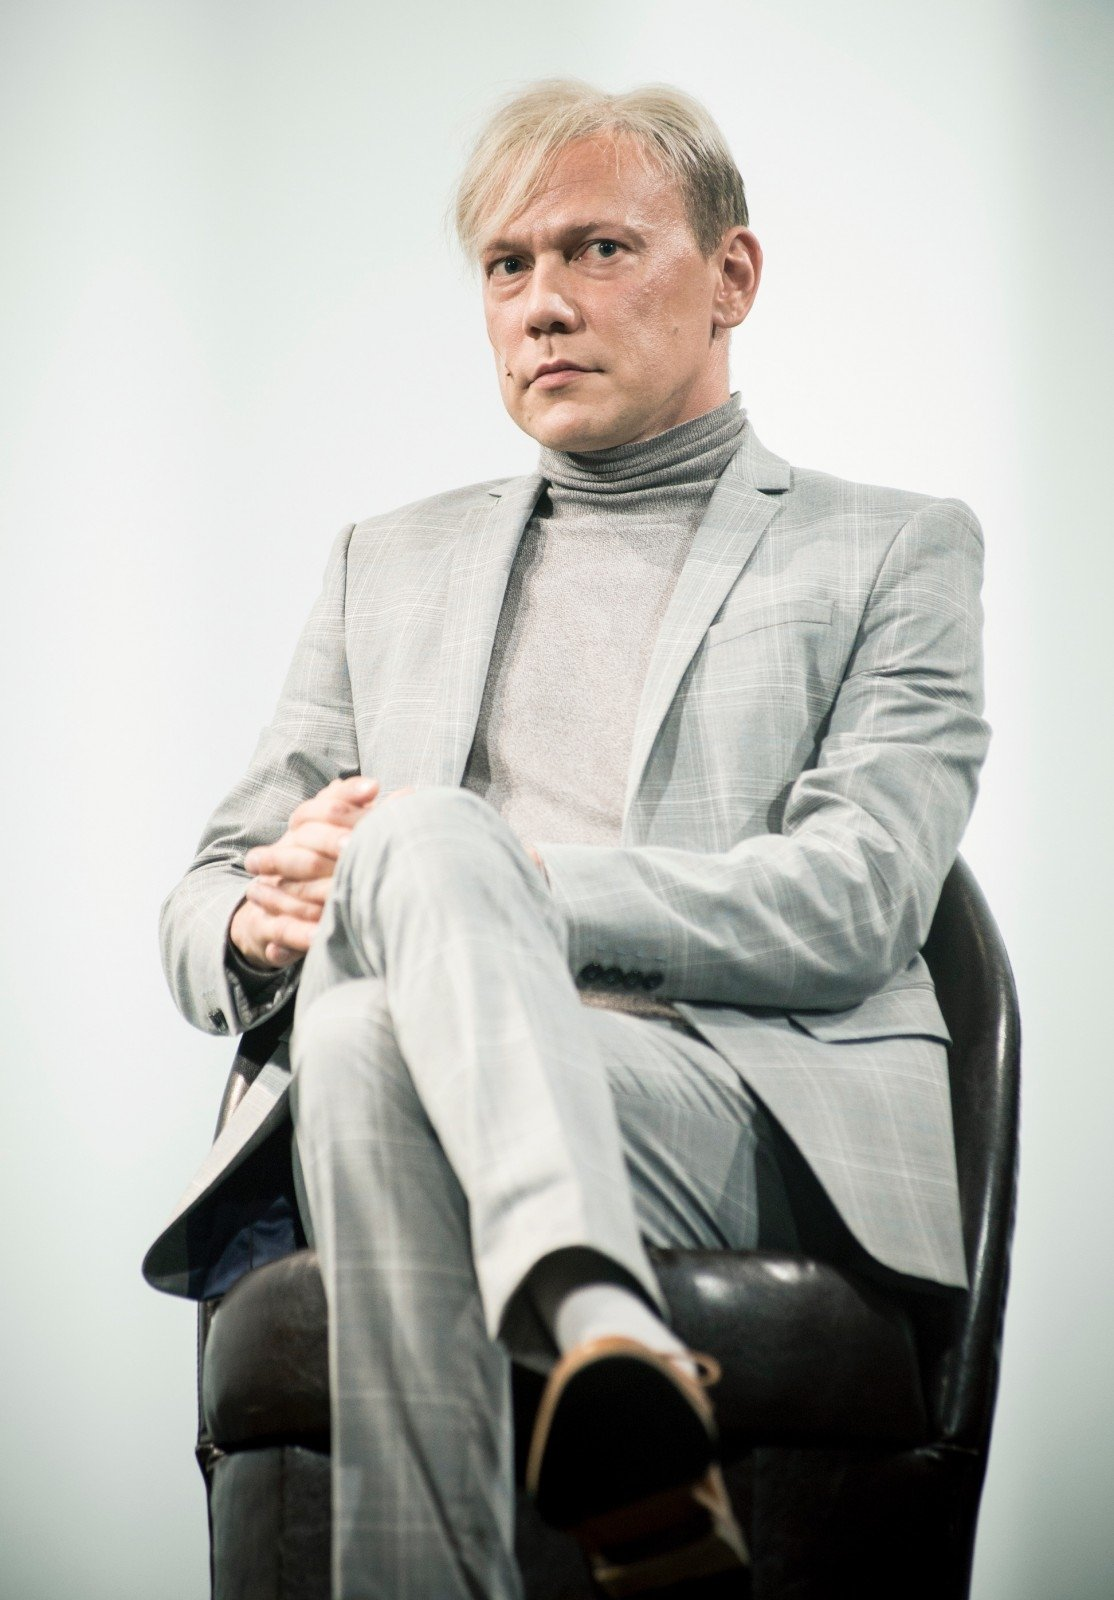 Ivanauskas